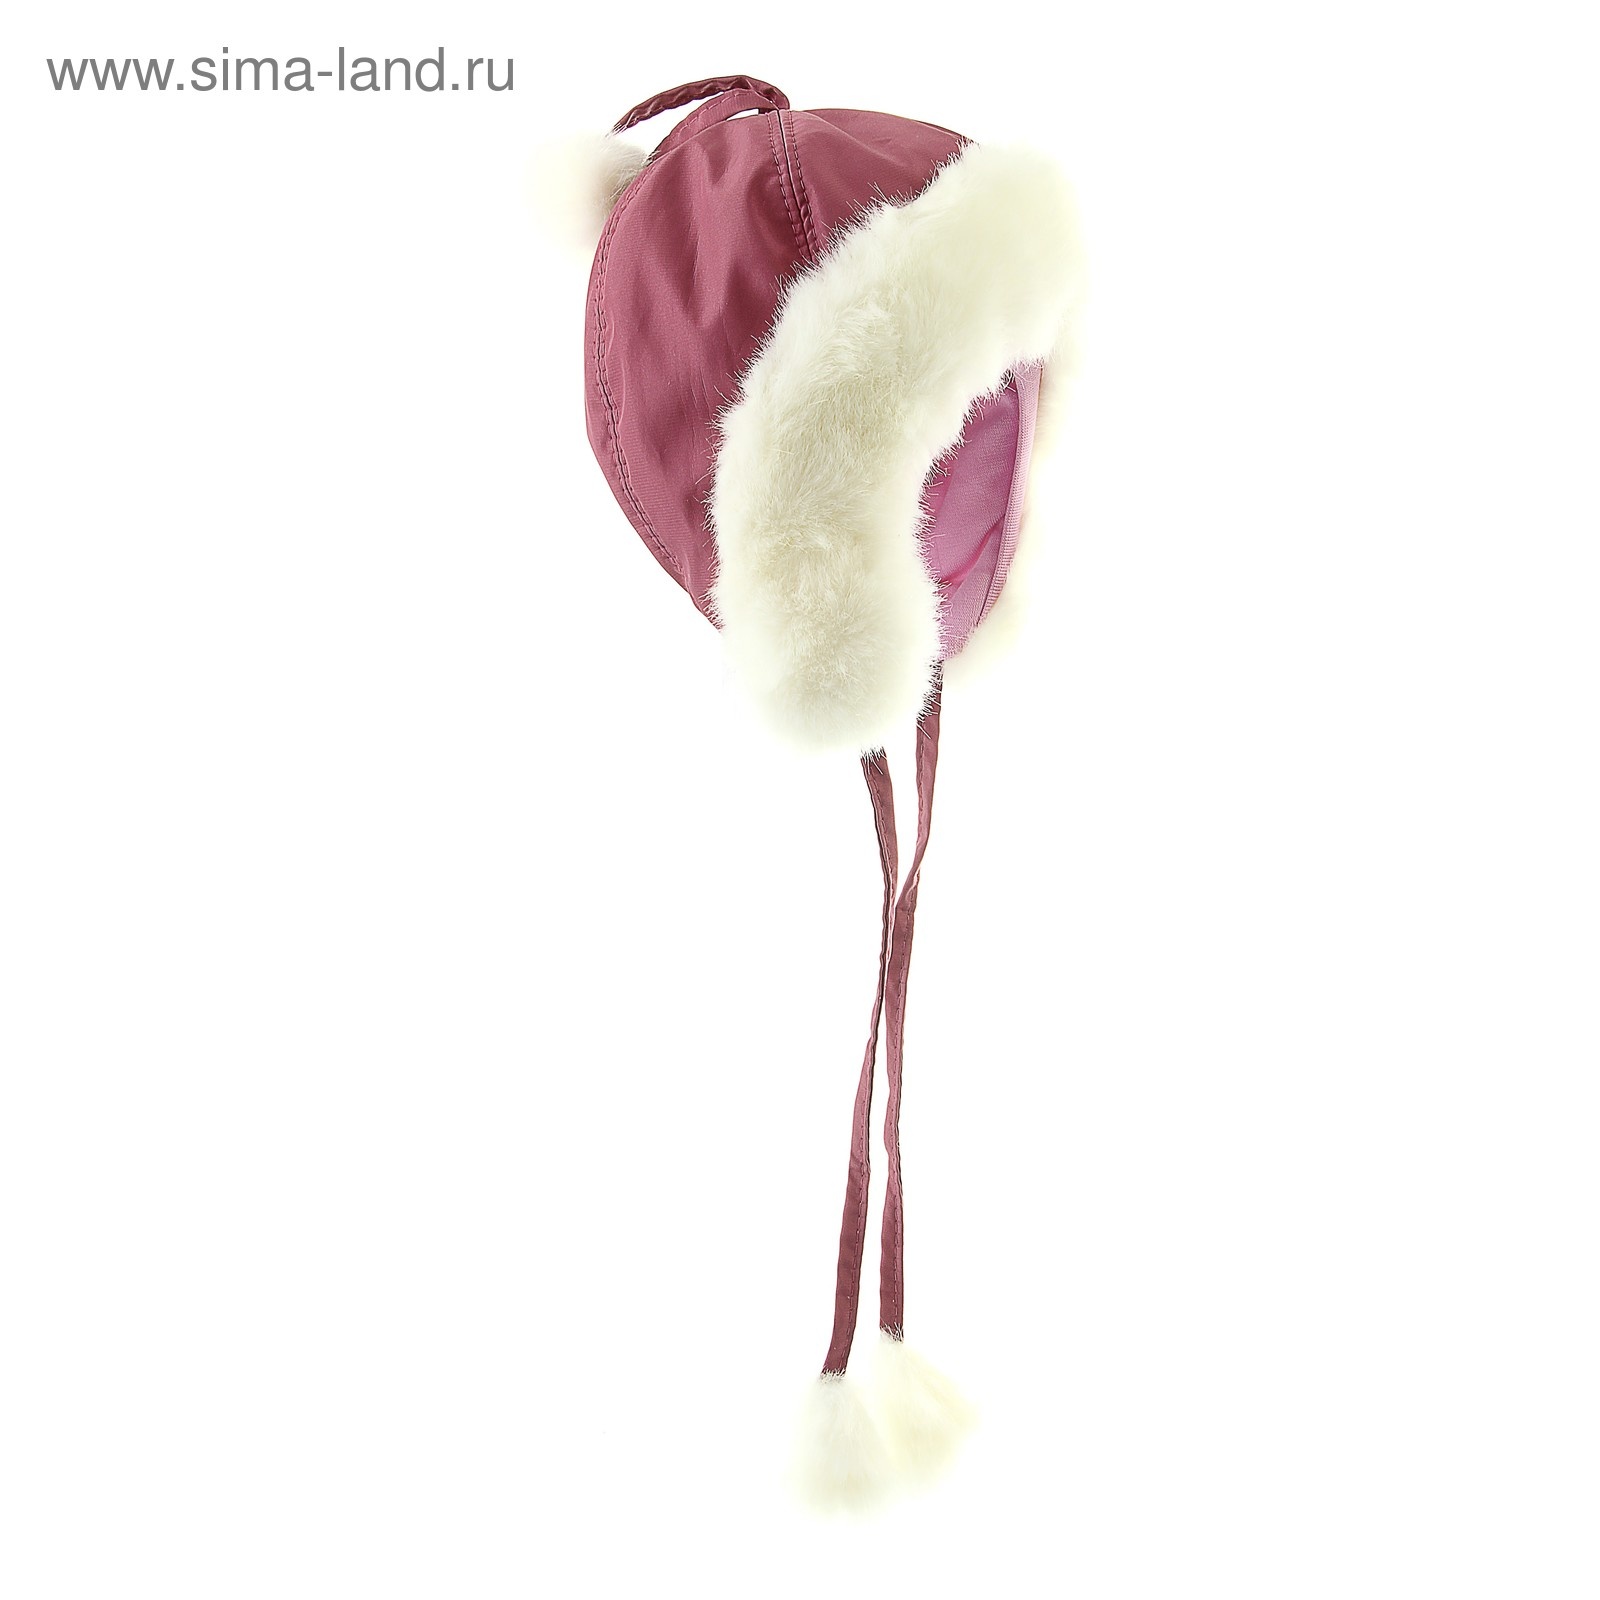 Грязно-розовый цвет шапки